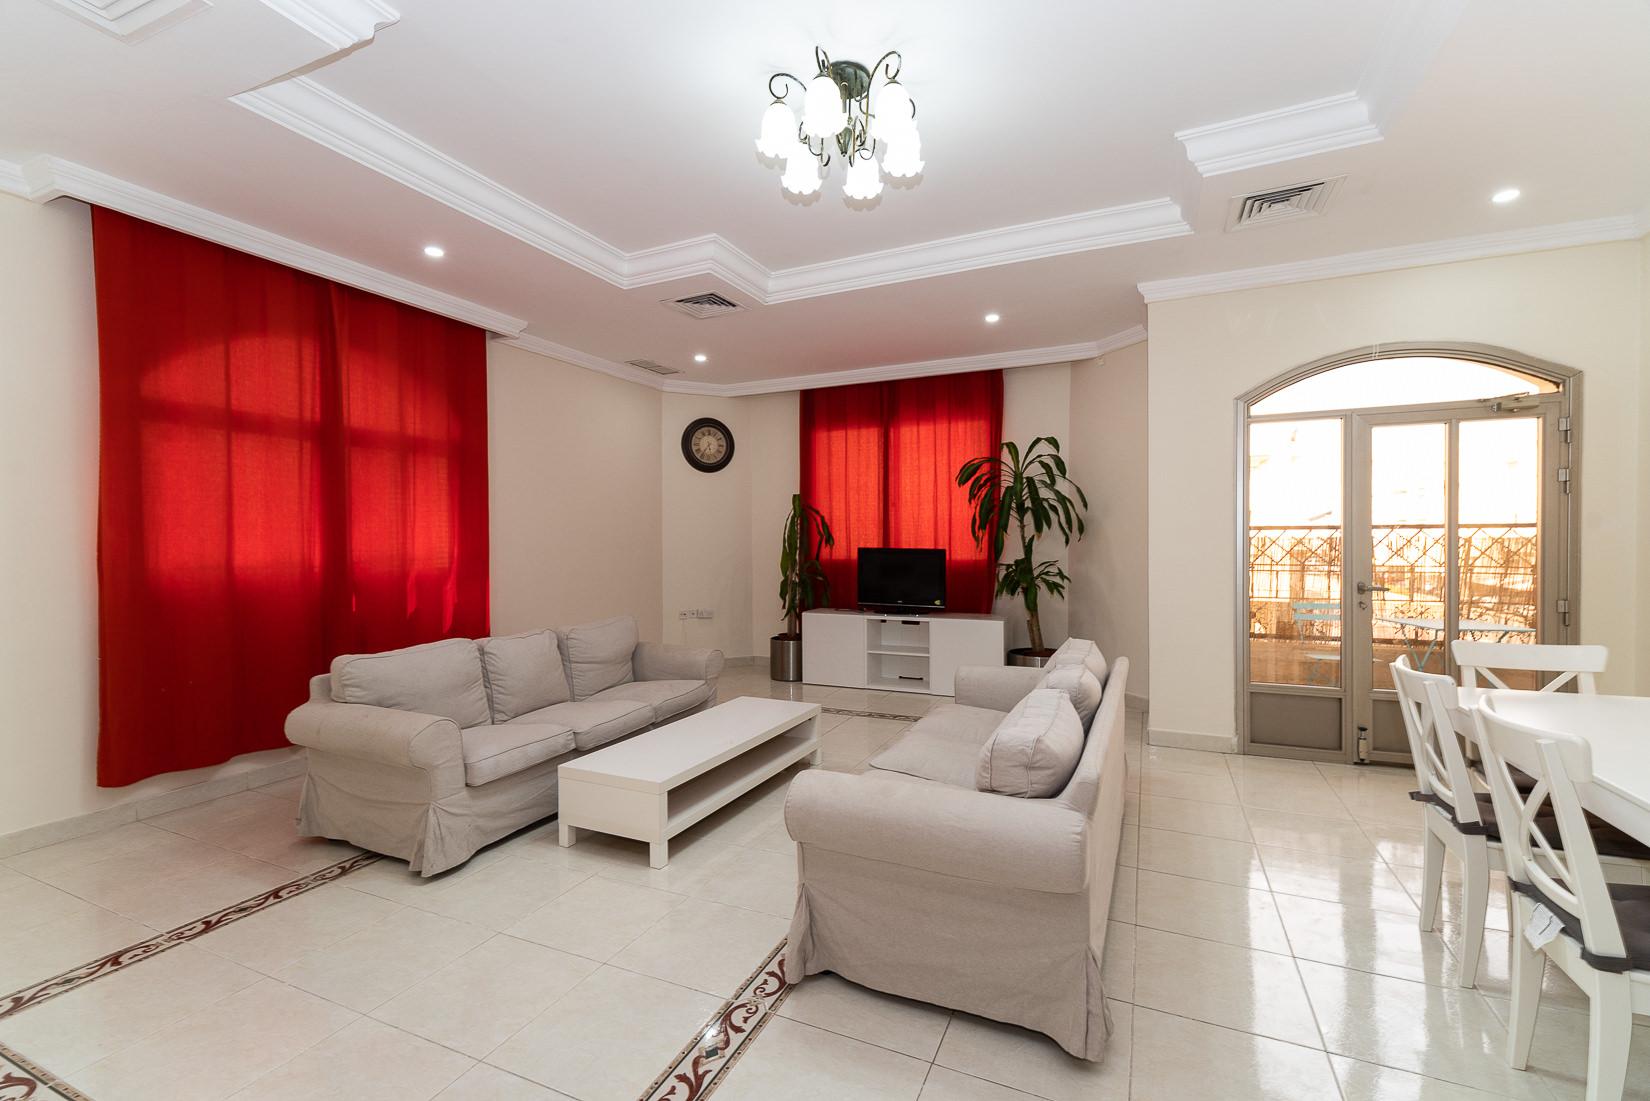 Mangaf – older, spacious, semi furnished floor